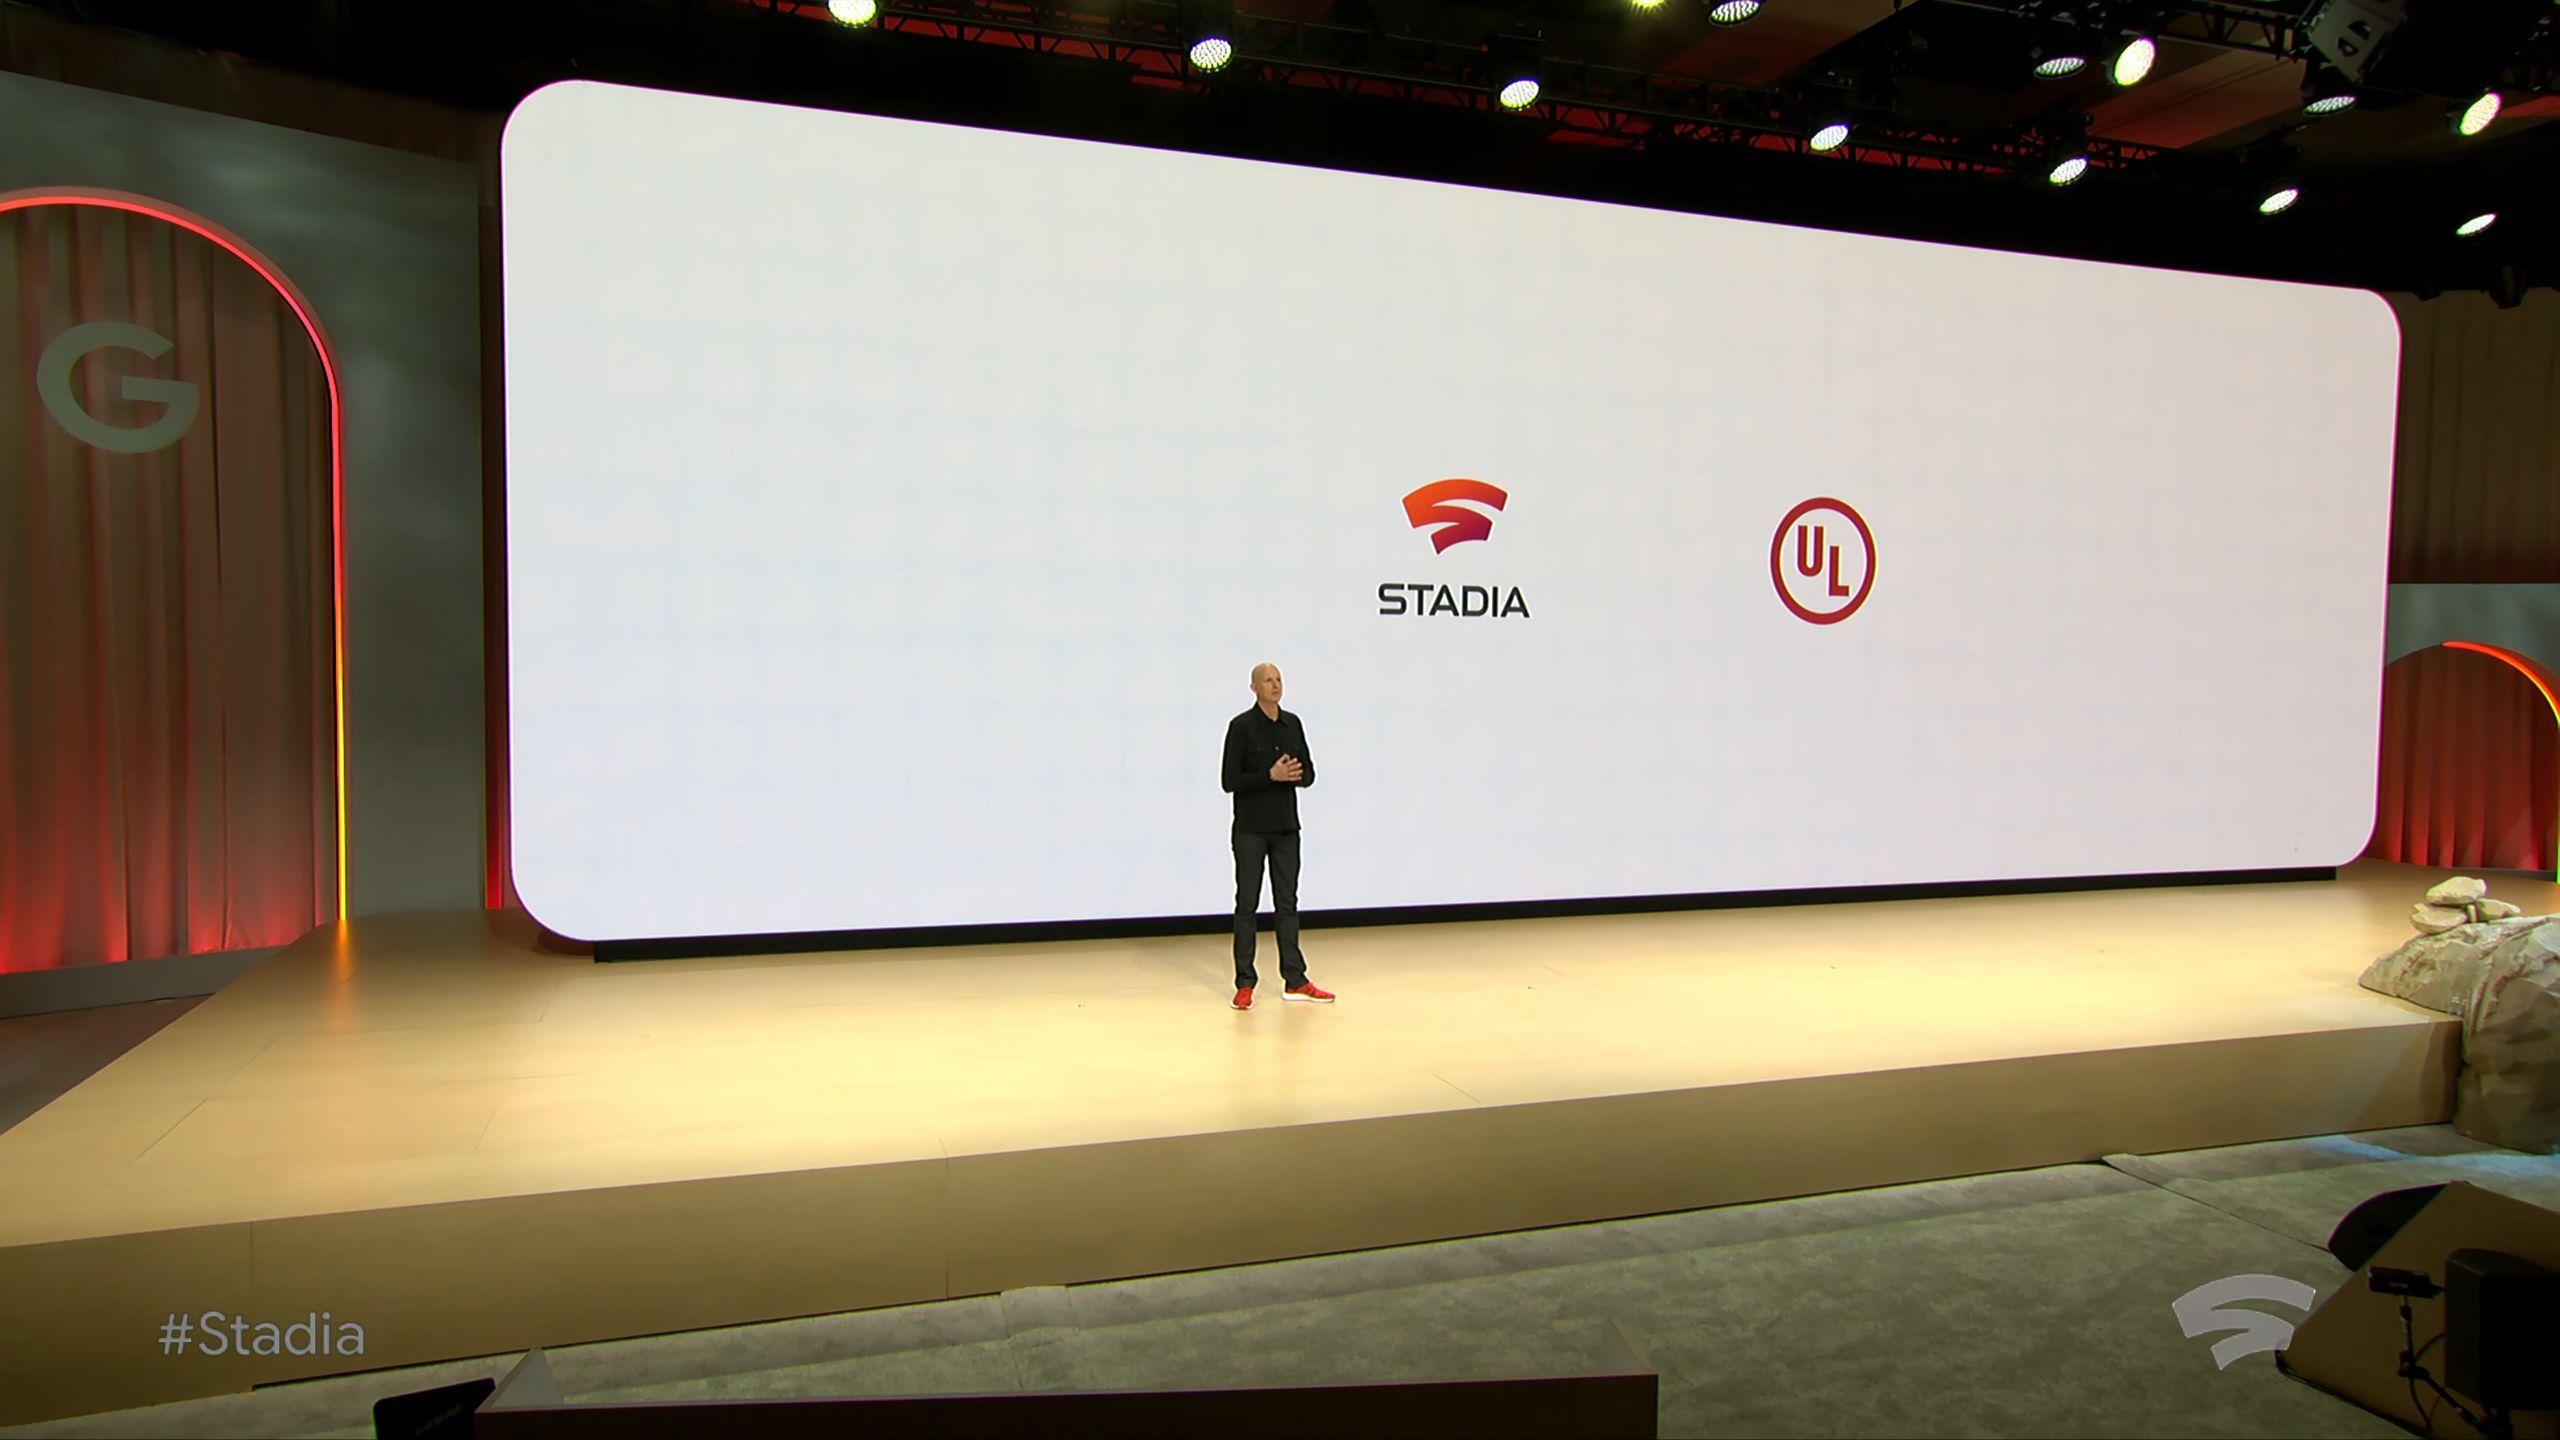 Google introduces Stadia cloud gaming platform at GDC with a UL tech demo